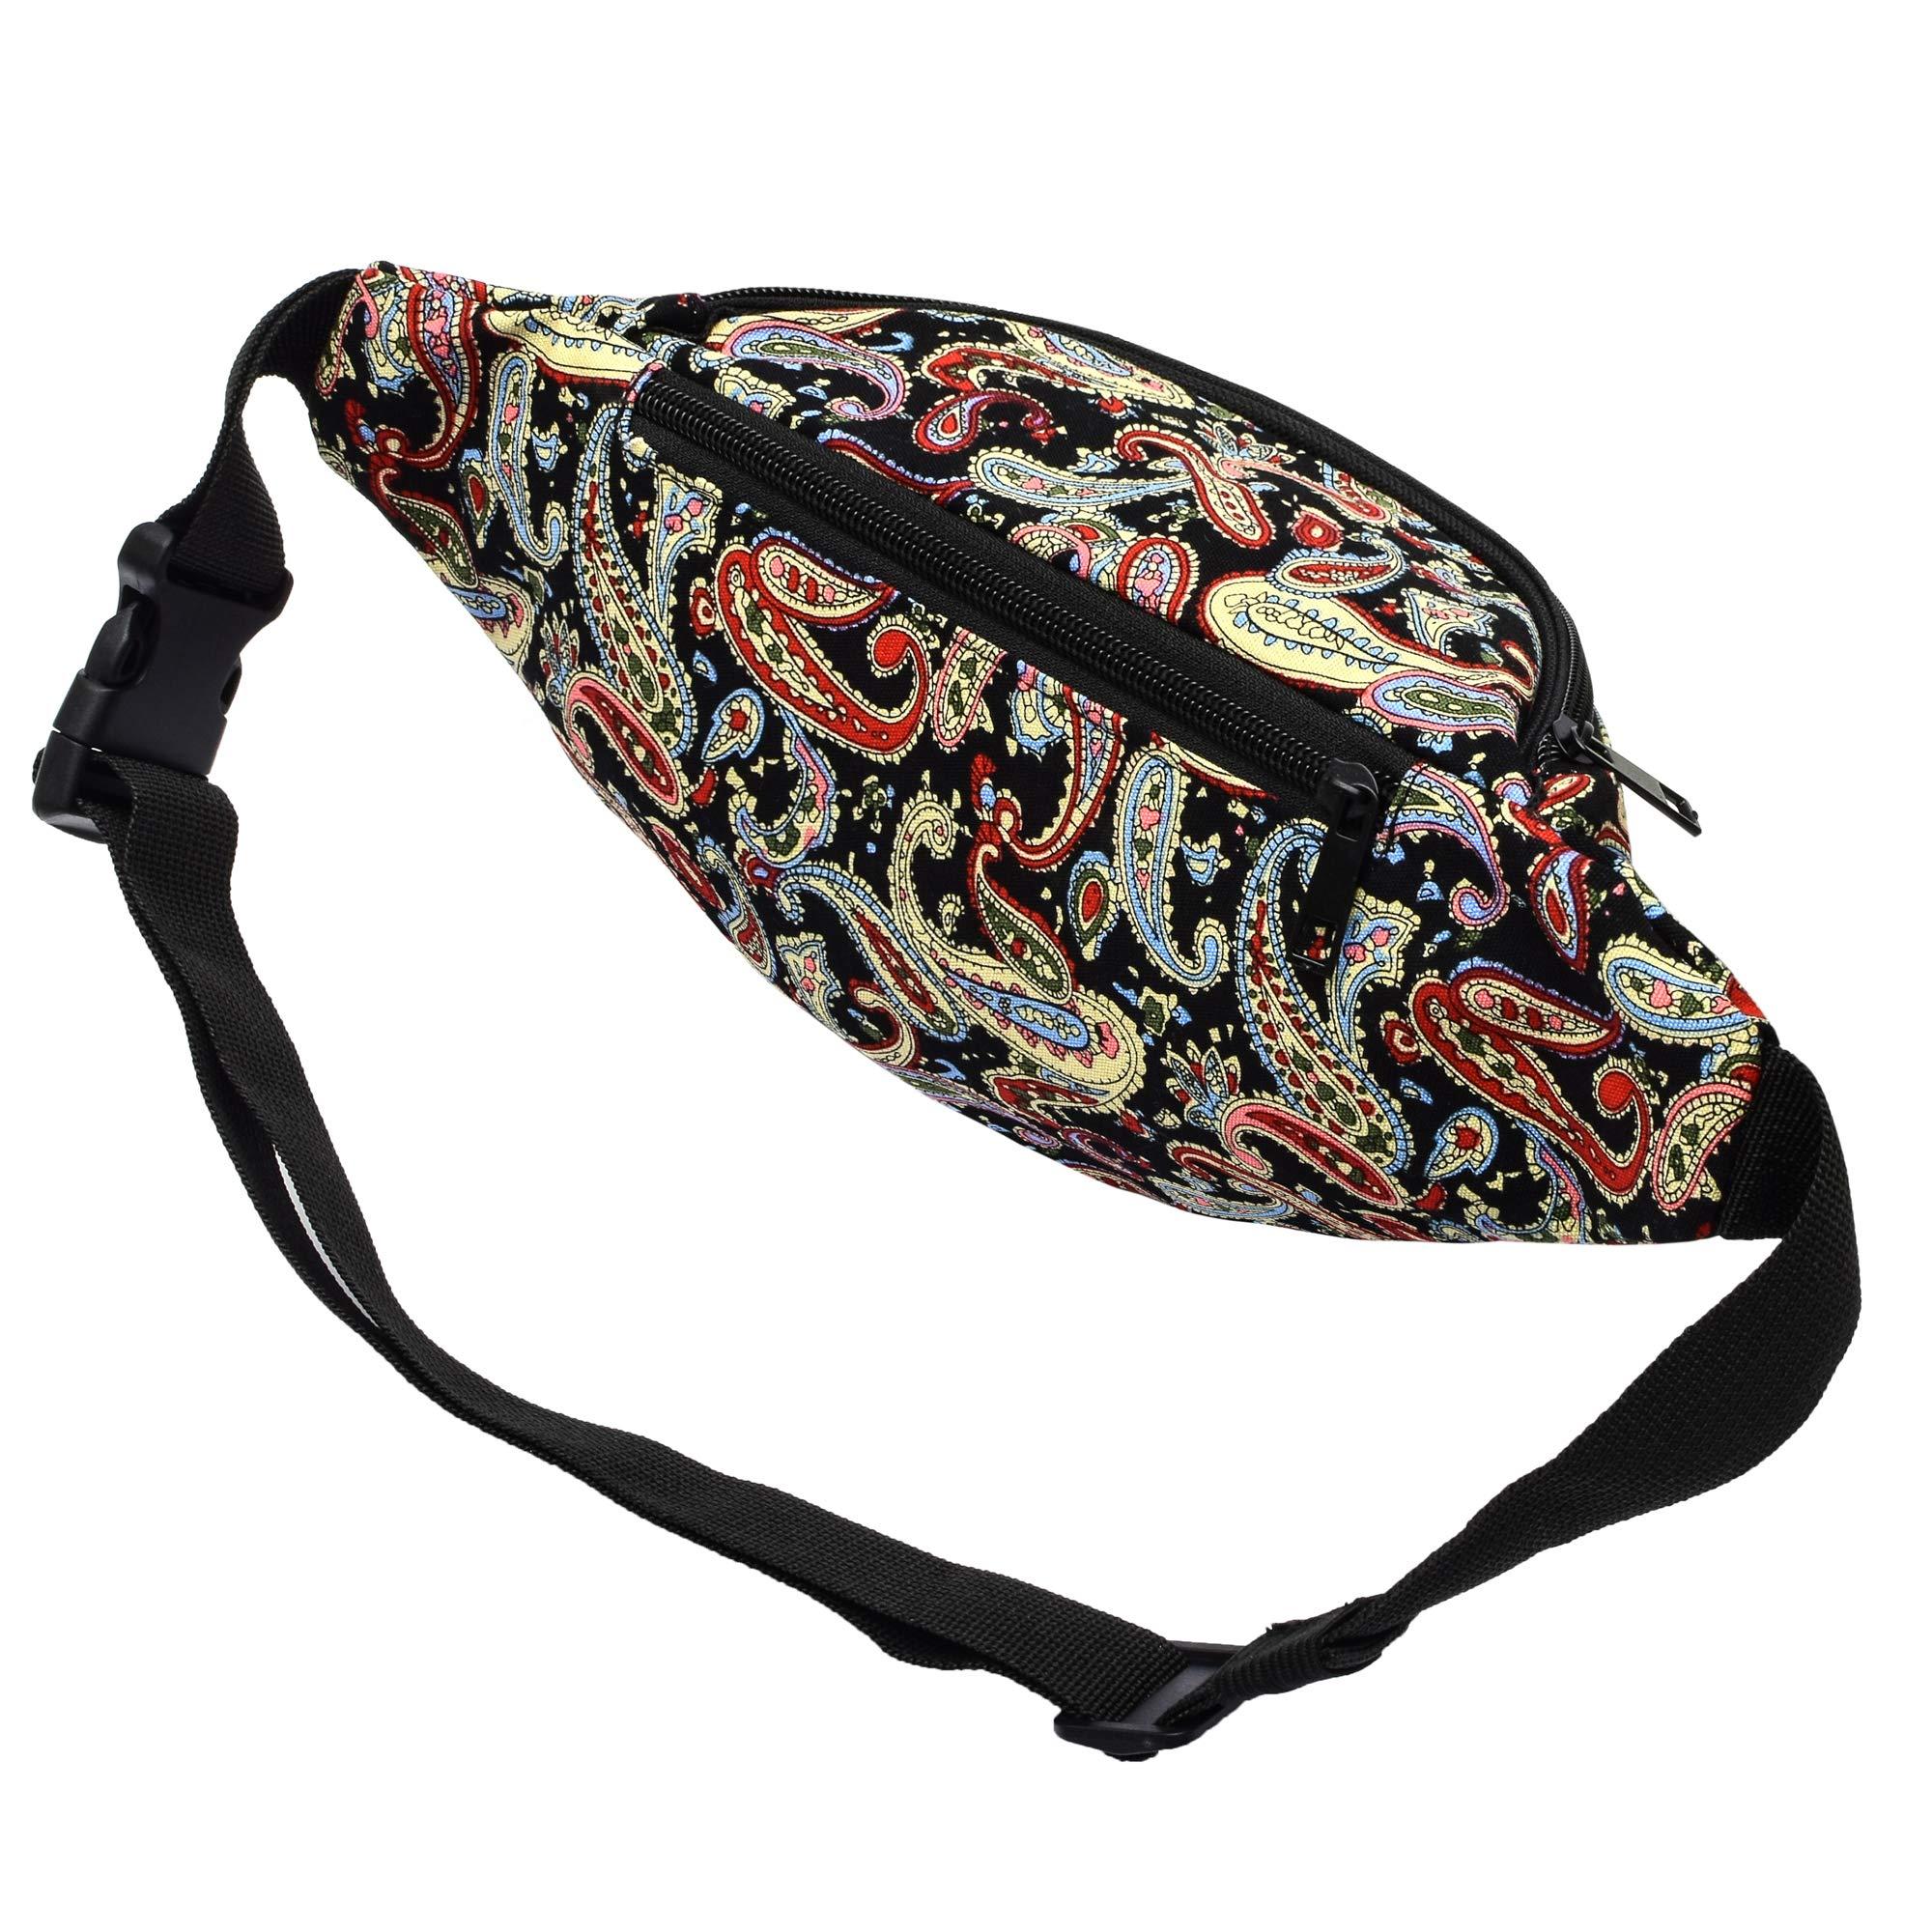 Kayhoma 2 Zippers Paisley Boho Fanny Pack Cute Festival Rave Retro Vintage Flat Bum Bags Travel Waist Belt Purse